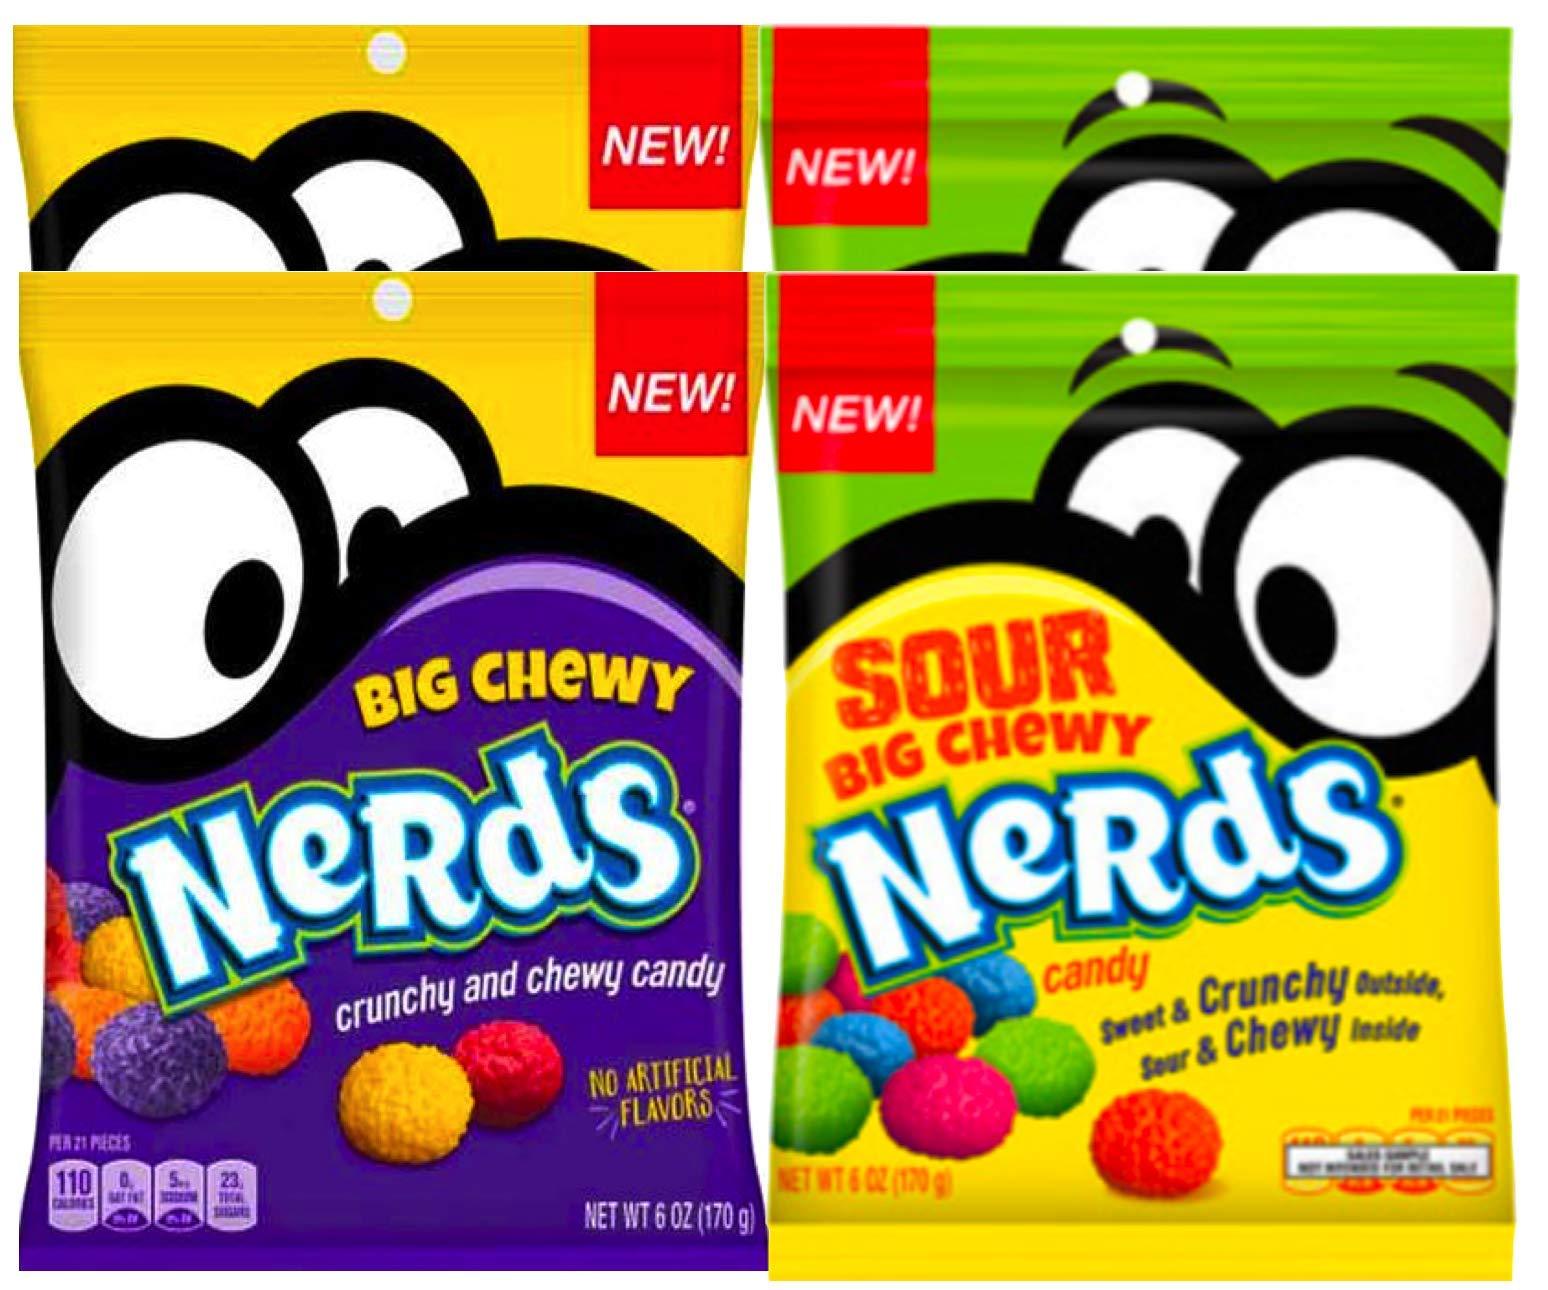 NEW Nerds Big Chewy Nerds Sour & Crunchy No Artificial Flavors Net WT 6oz (4)